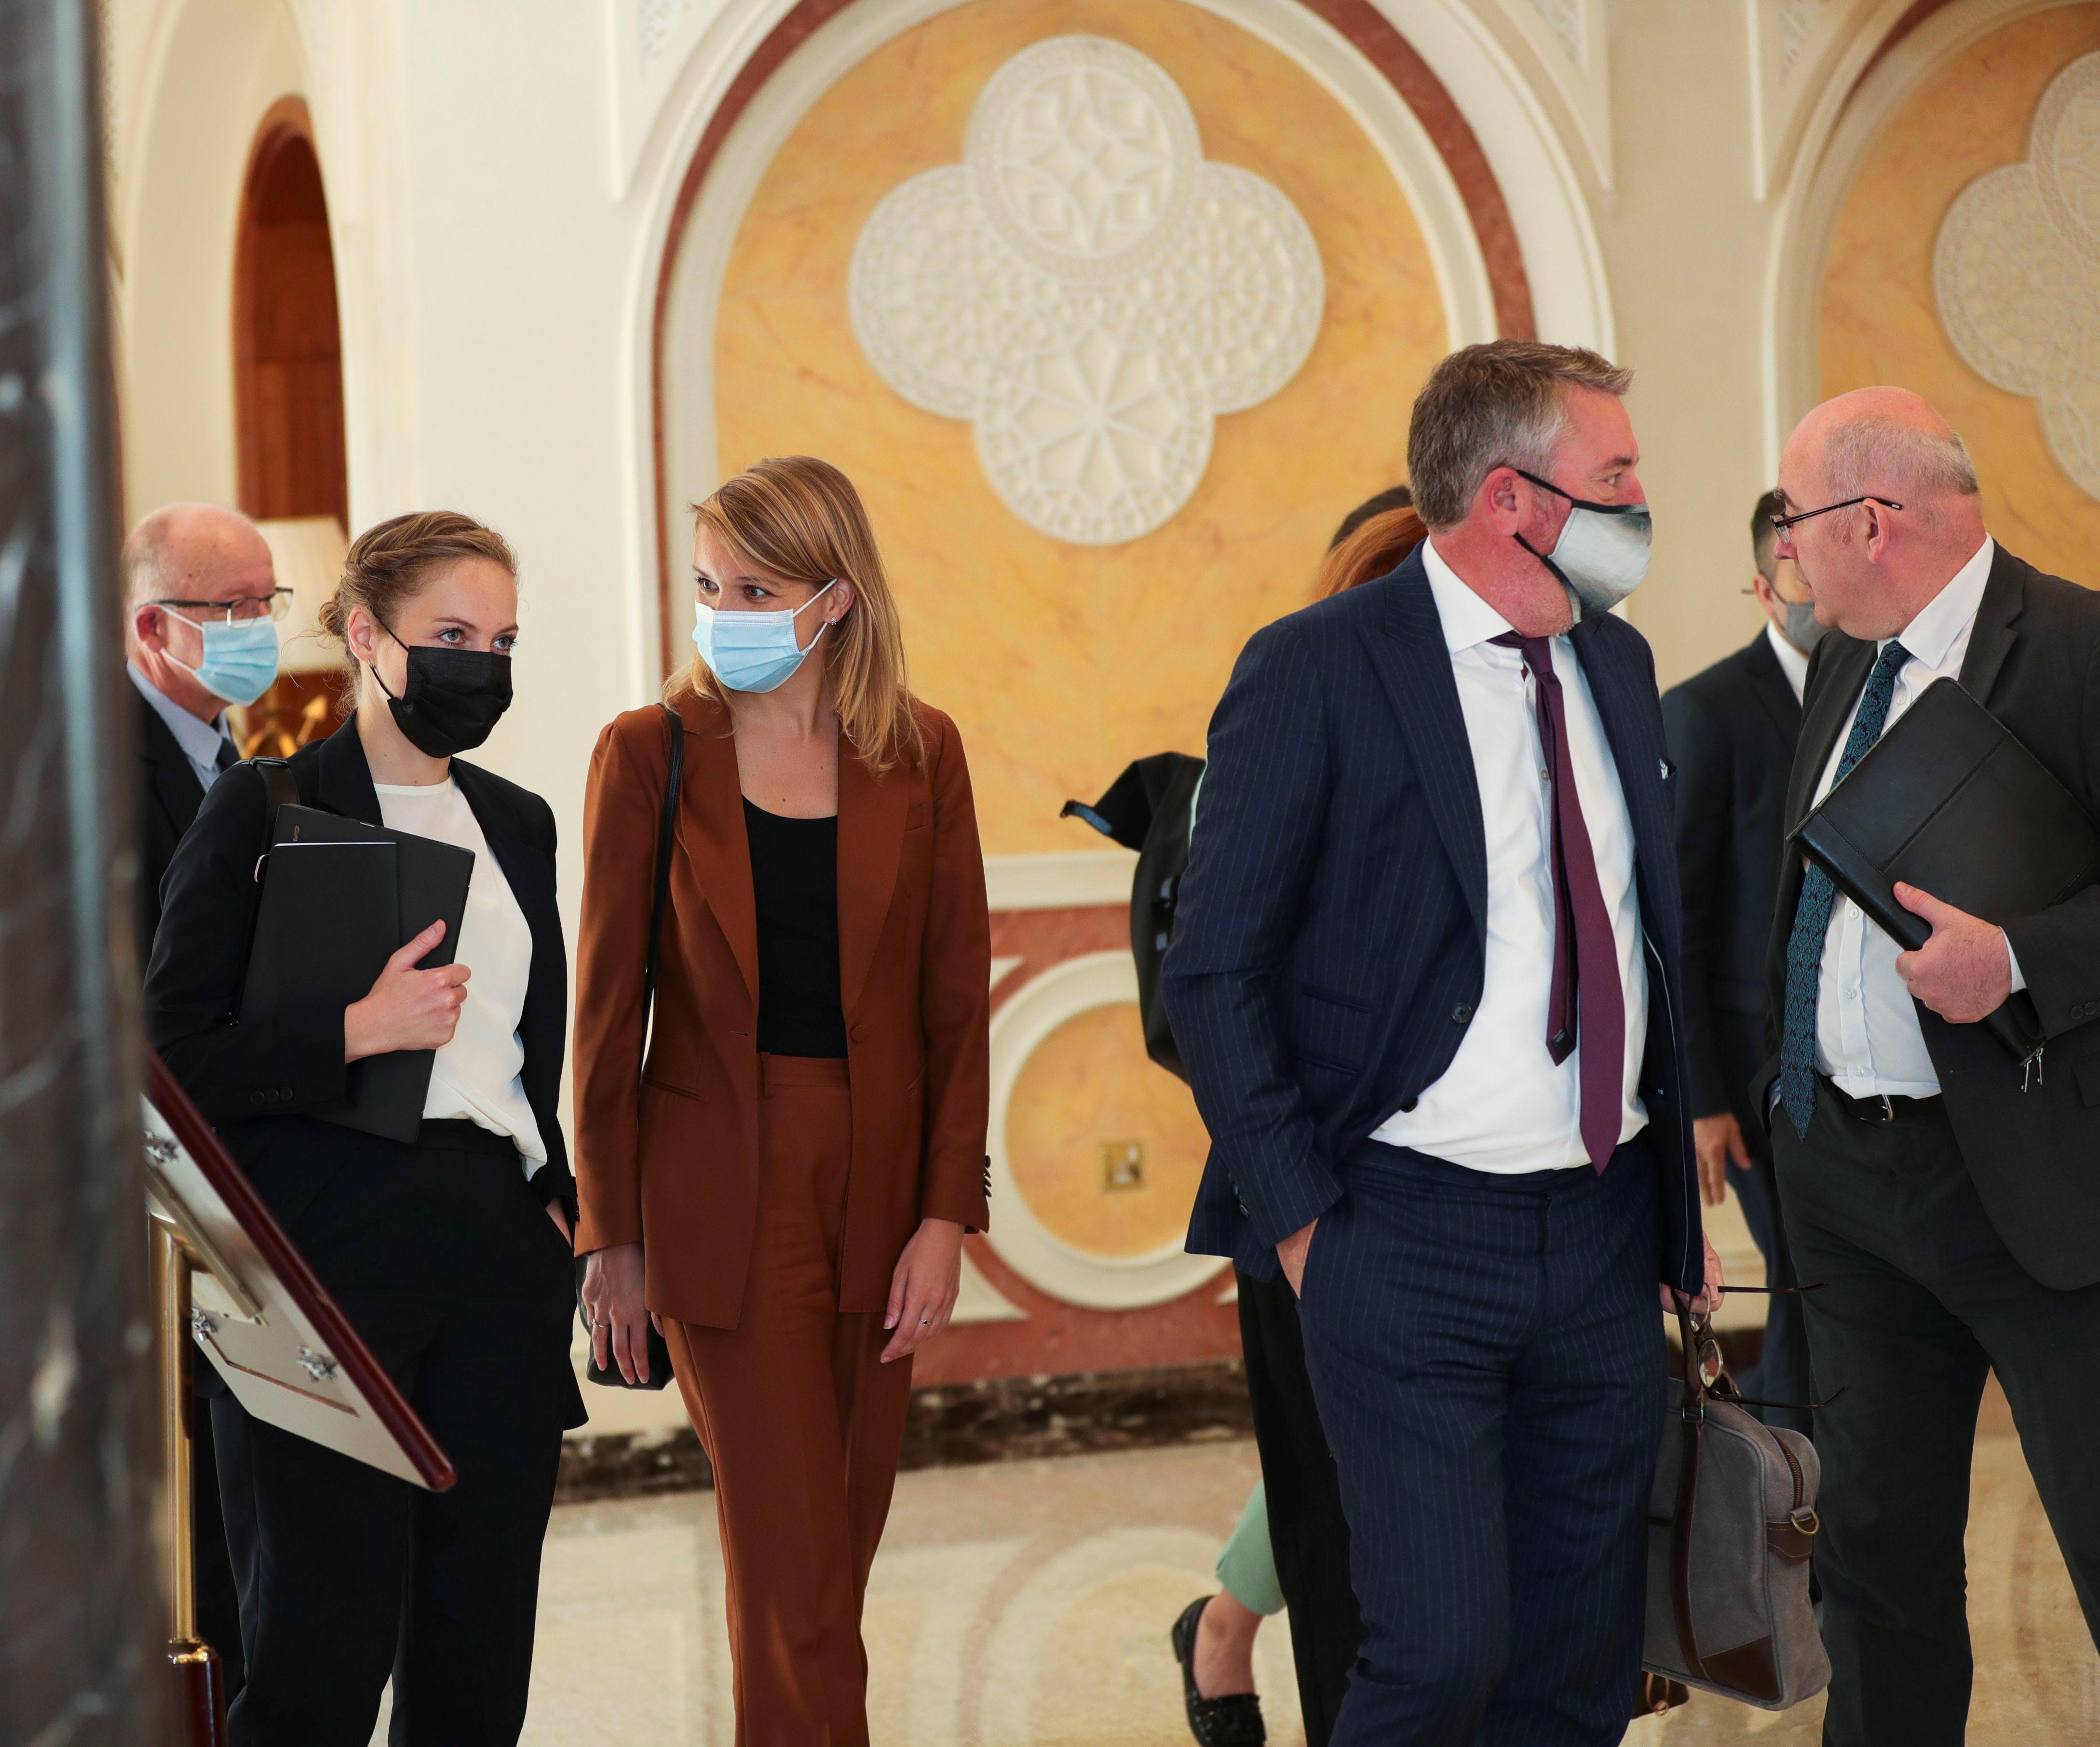 Foreign delegates arrive to meet with Taliban delegates in Doha, Qatar October 12, 2021. REUTERS/Stringer